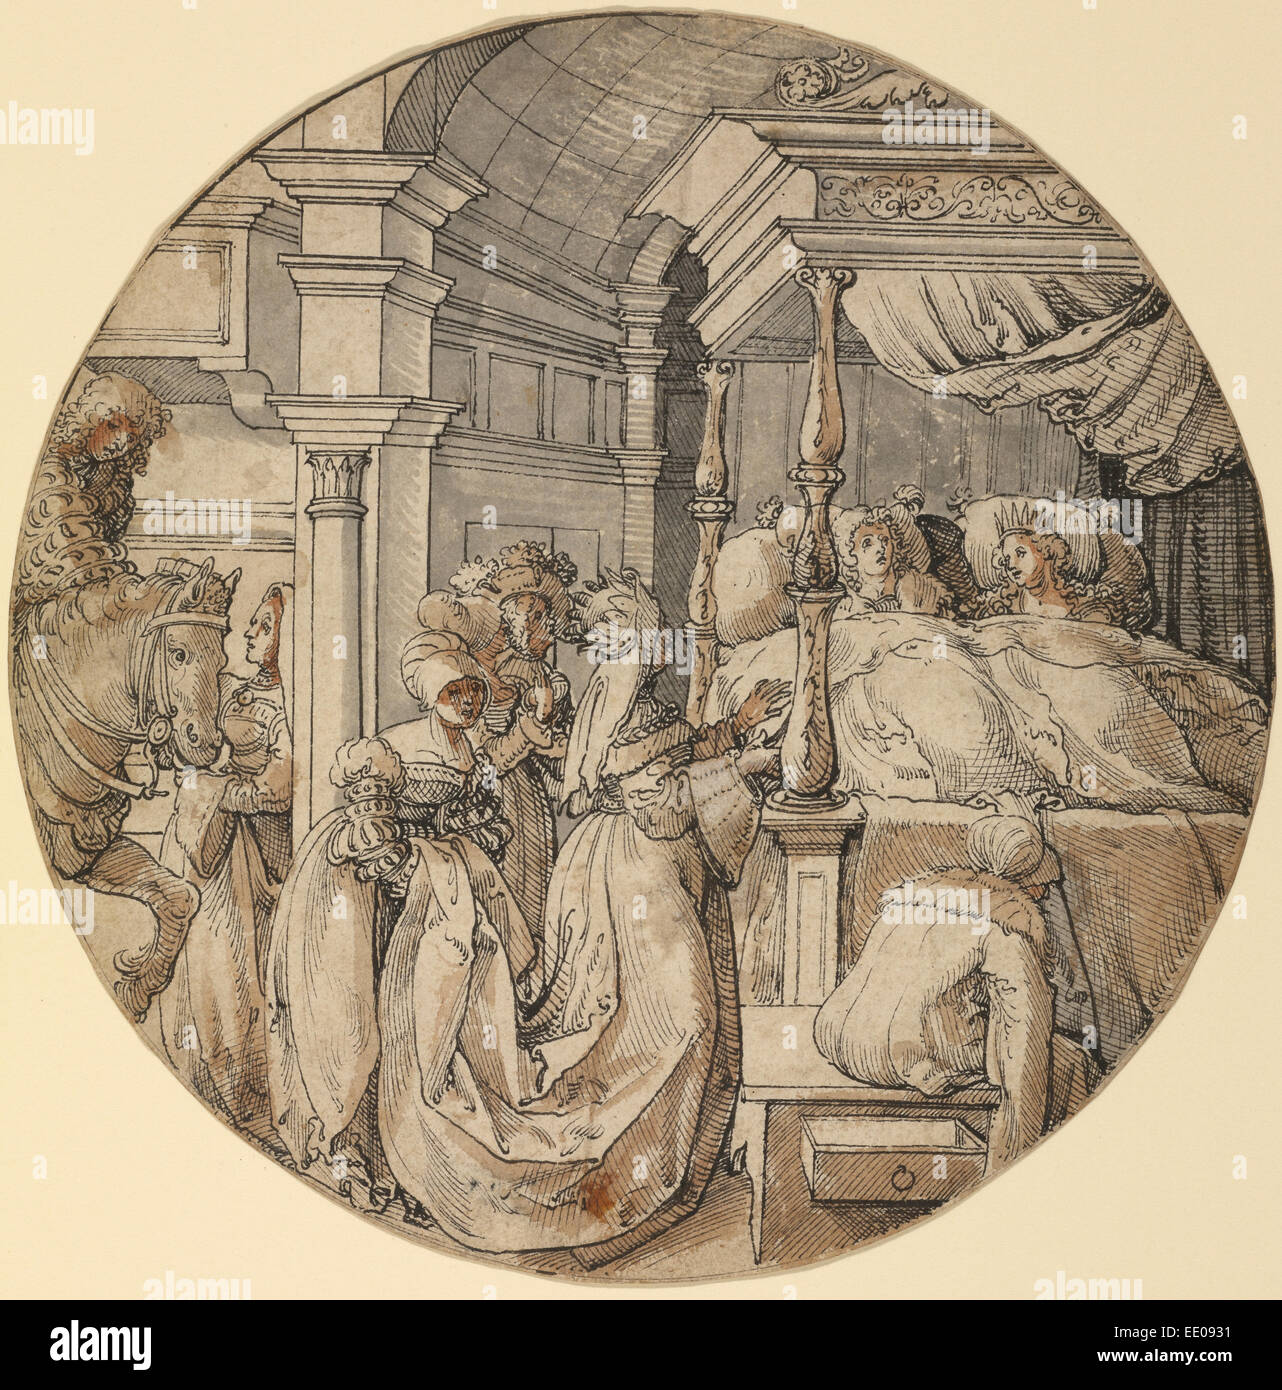 Bridal Scene; Jörg Breu the Elder, German, about 1475/1476 - 1537; Germany, Europe; about 1520 - 1525; Pen - Stock Image